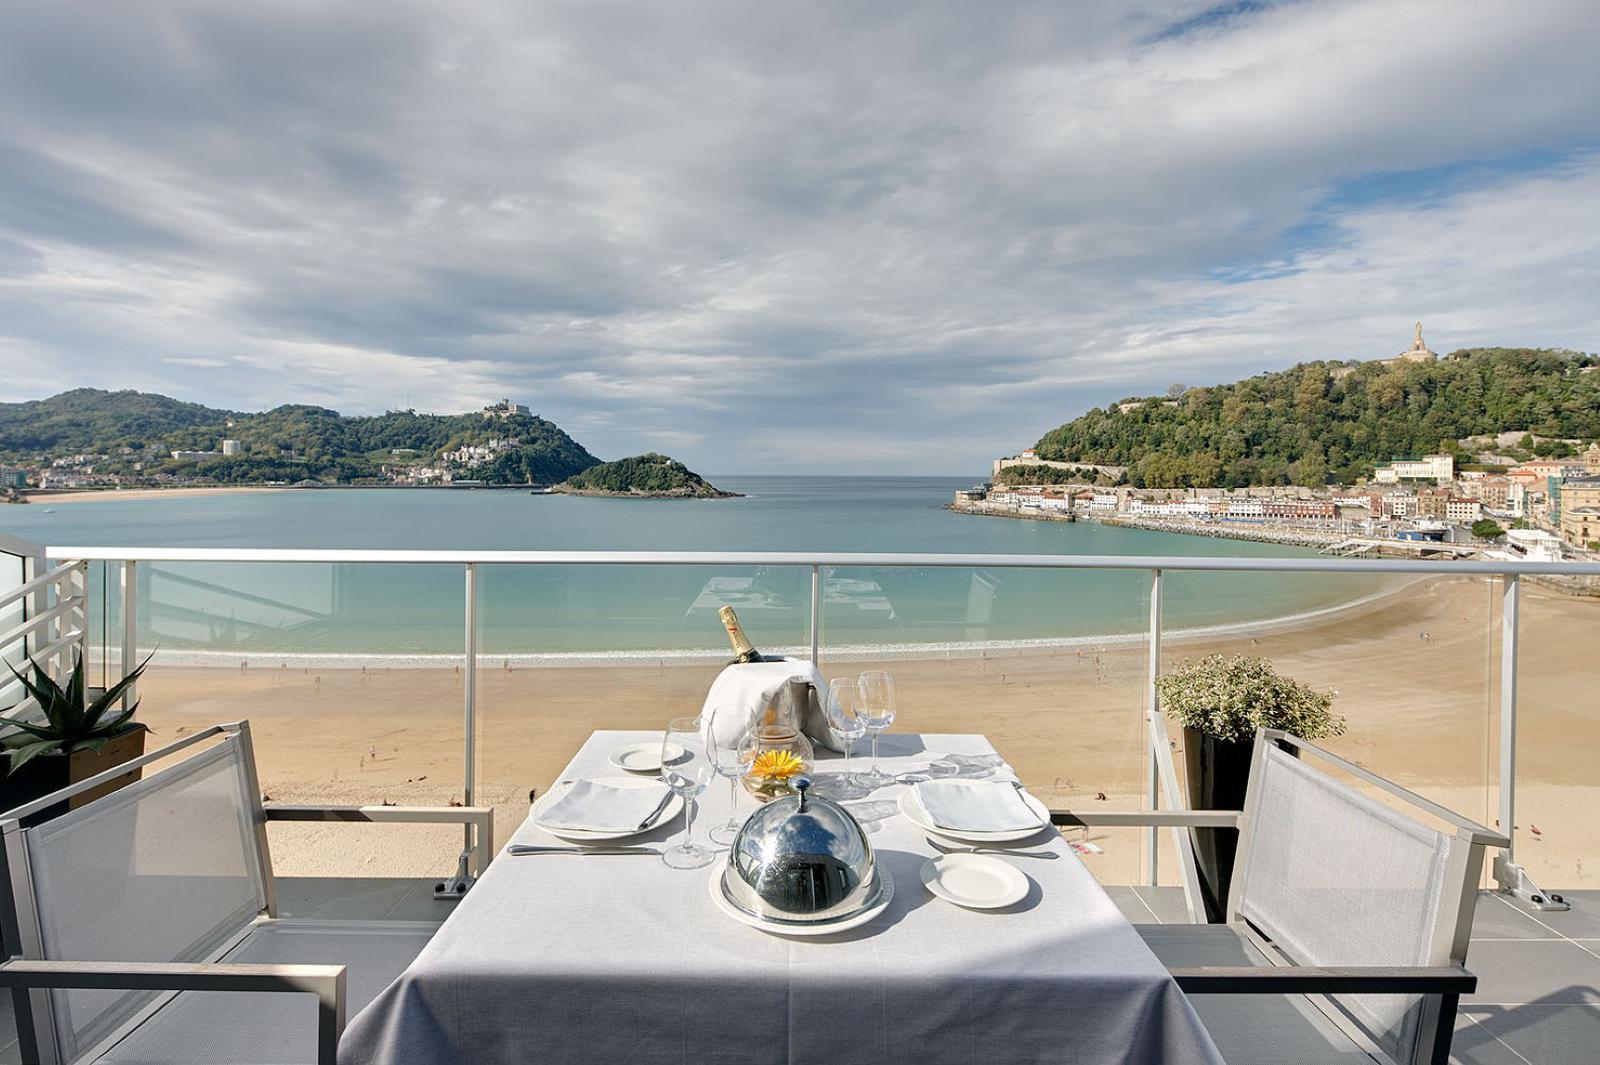 hoteles de playa Hotel Londres, San Sebastian, Gipuzkoa, Guipuzcoa, Pais Vasco, Spain